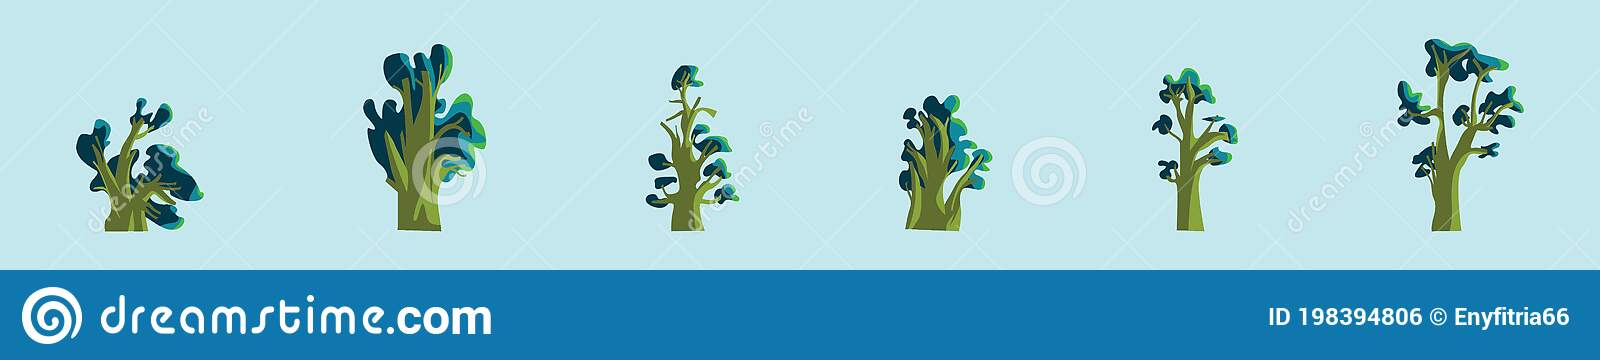 African Tree Cartoon Stock Illustrations 6 084 African Tree Cartoon Stock Illustrations Vectors Clipart Dreamstime Find images of cartoon tree. dreamstime com